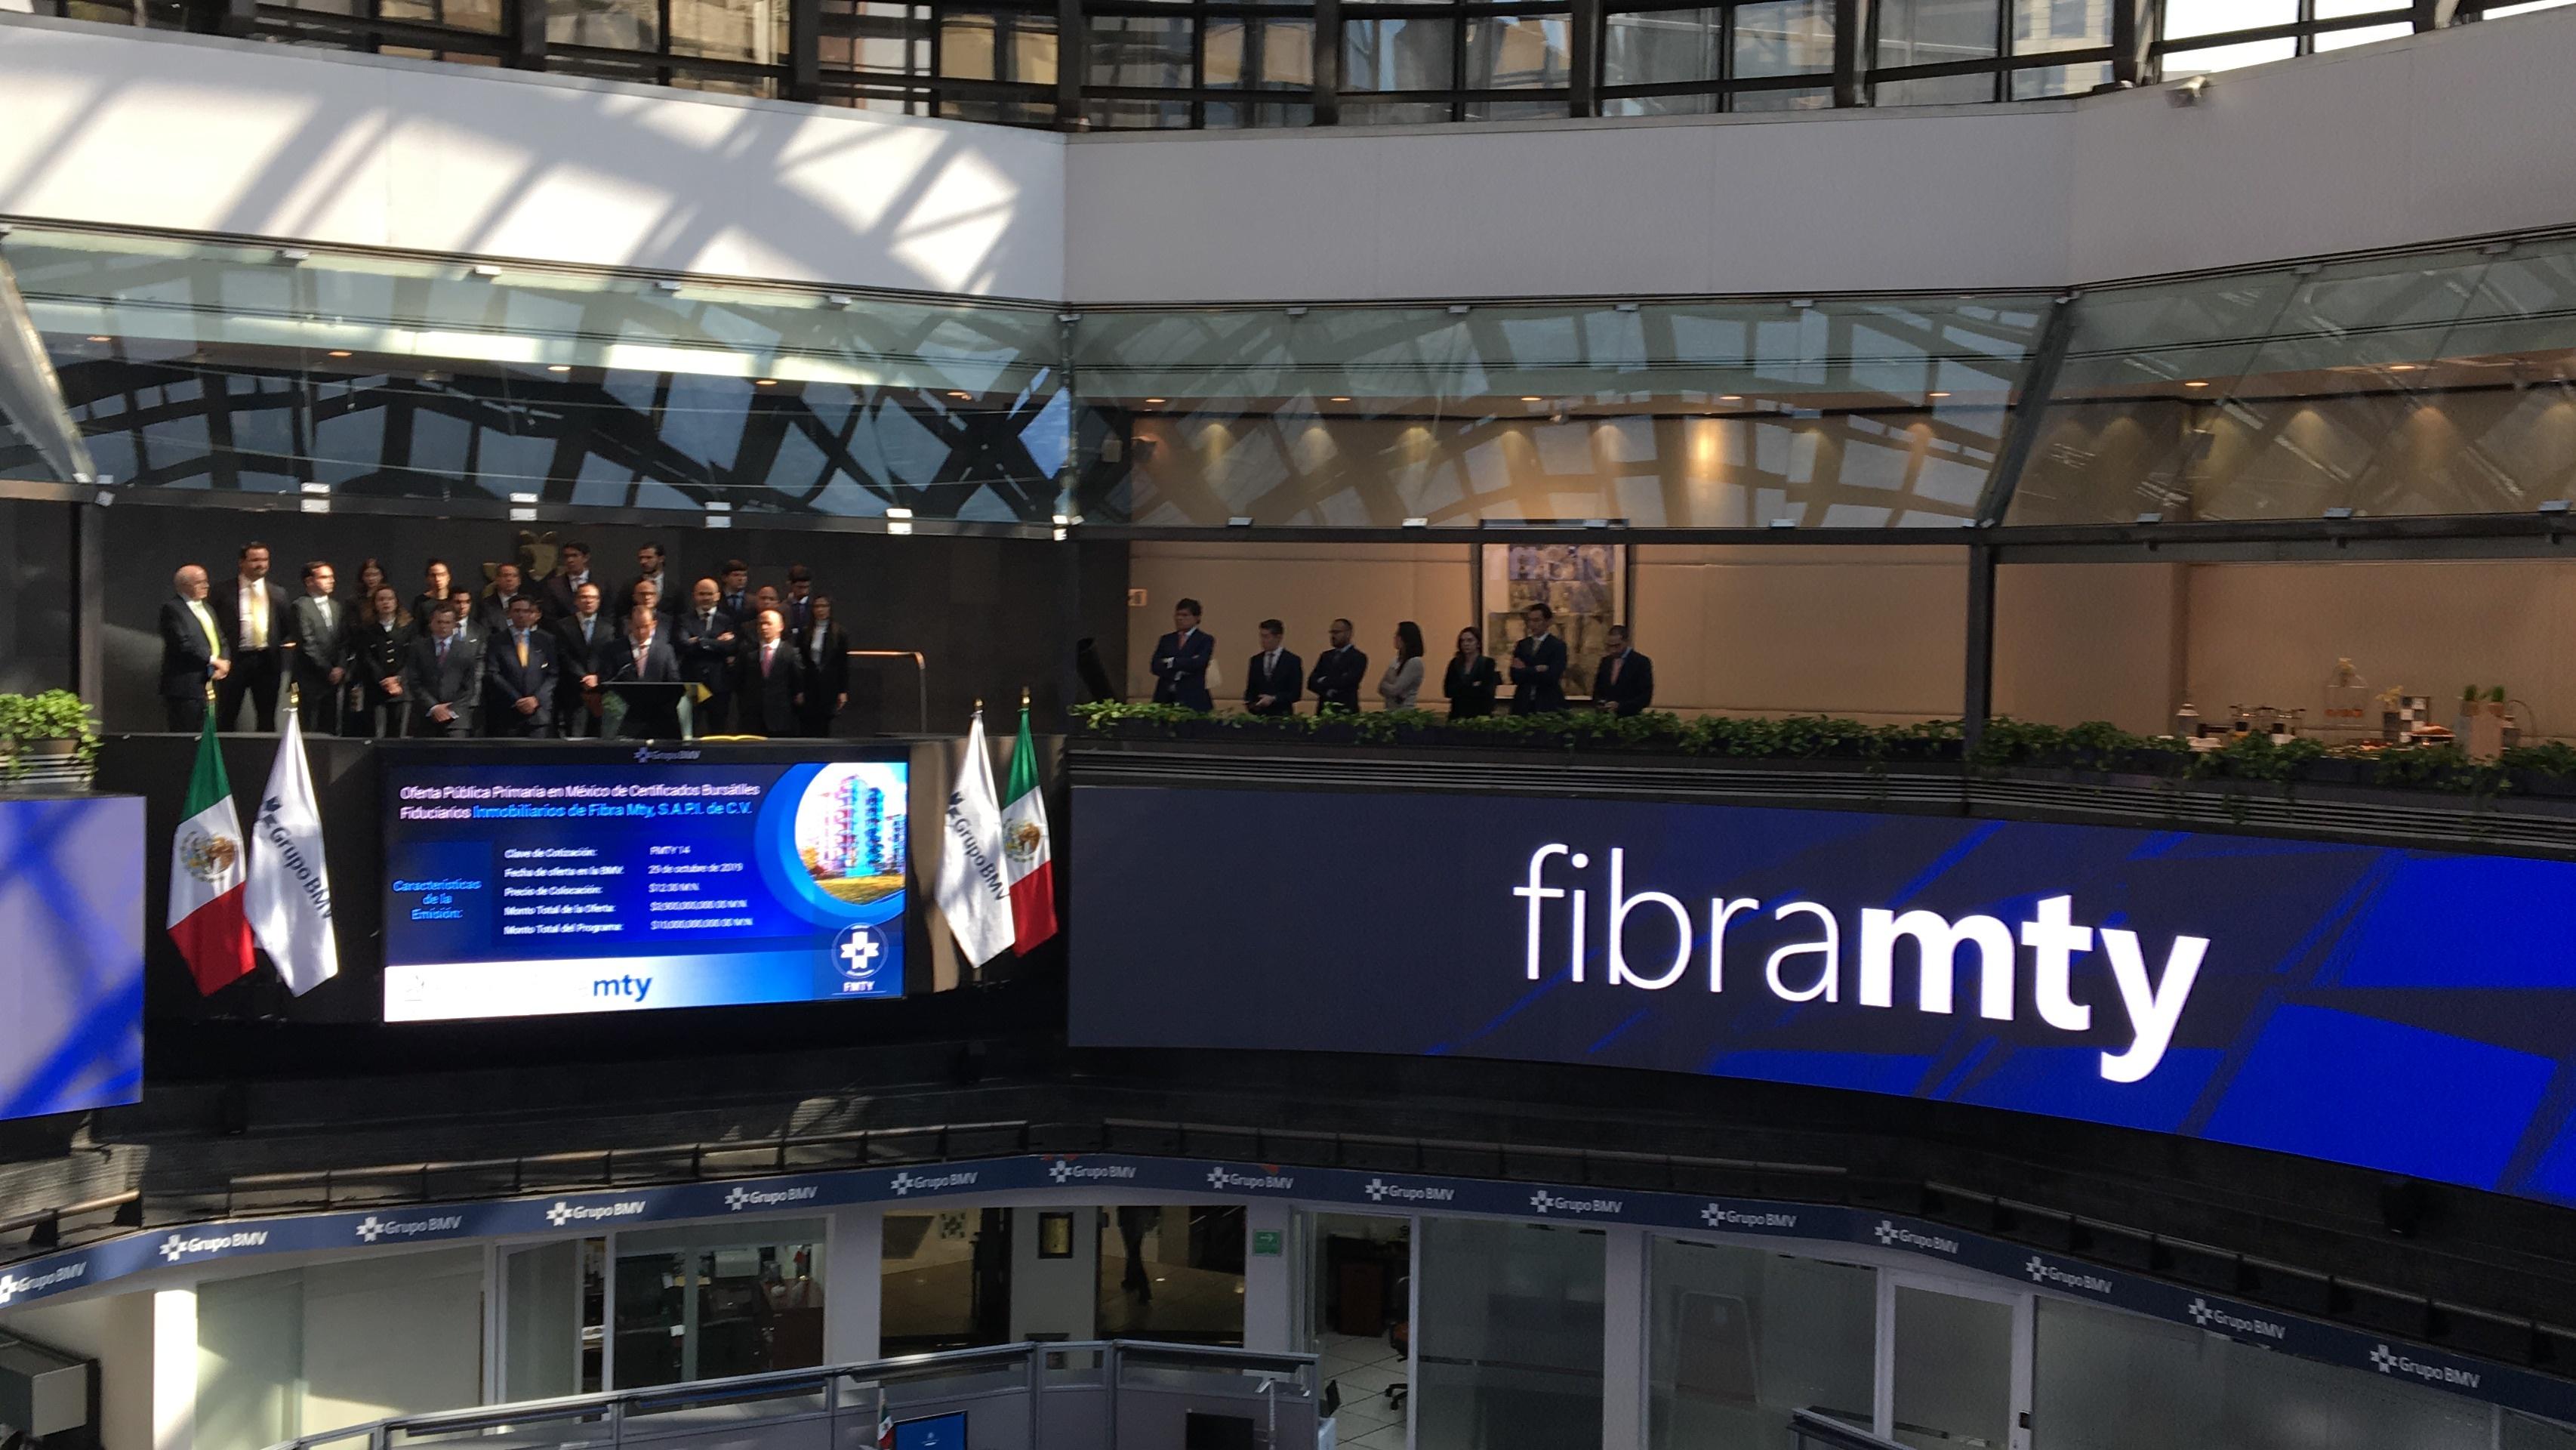 Fibra Mty emite bono por 115 mdd